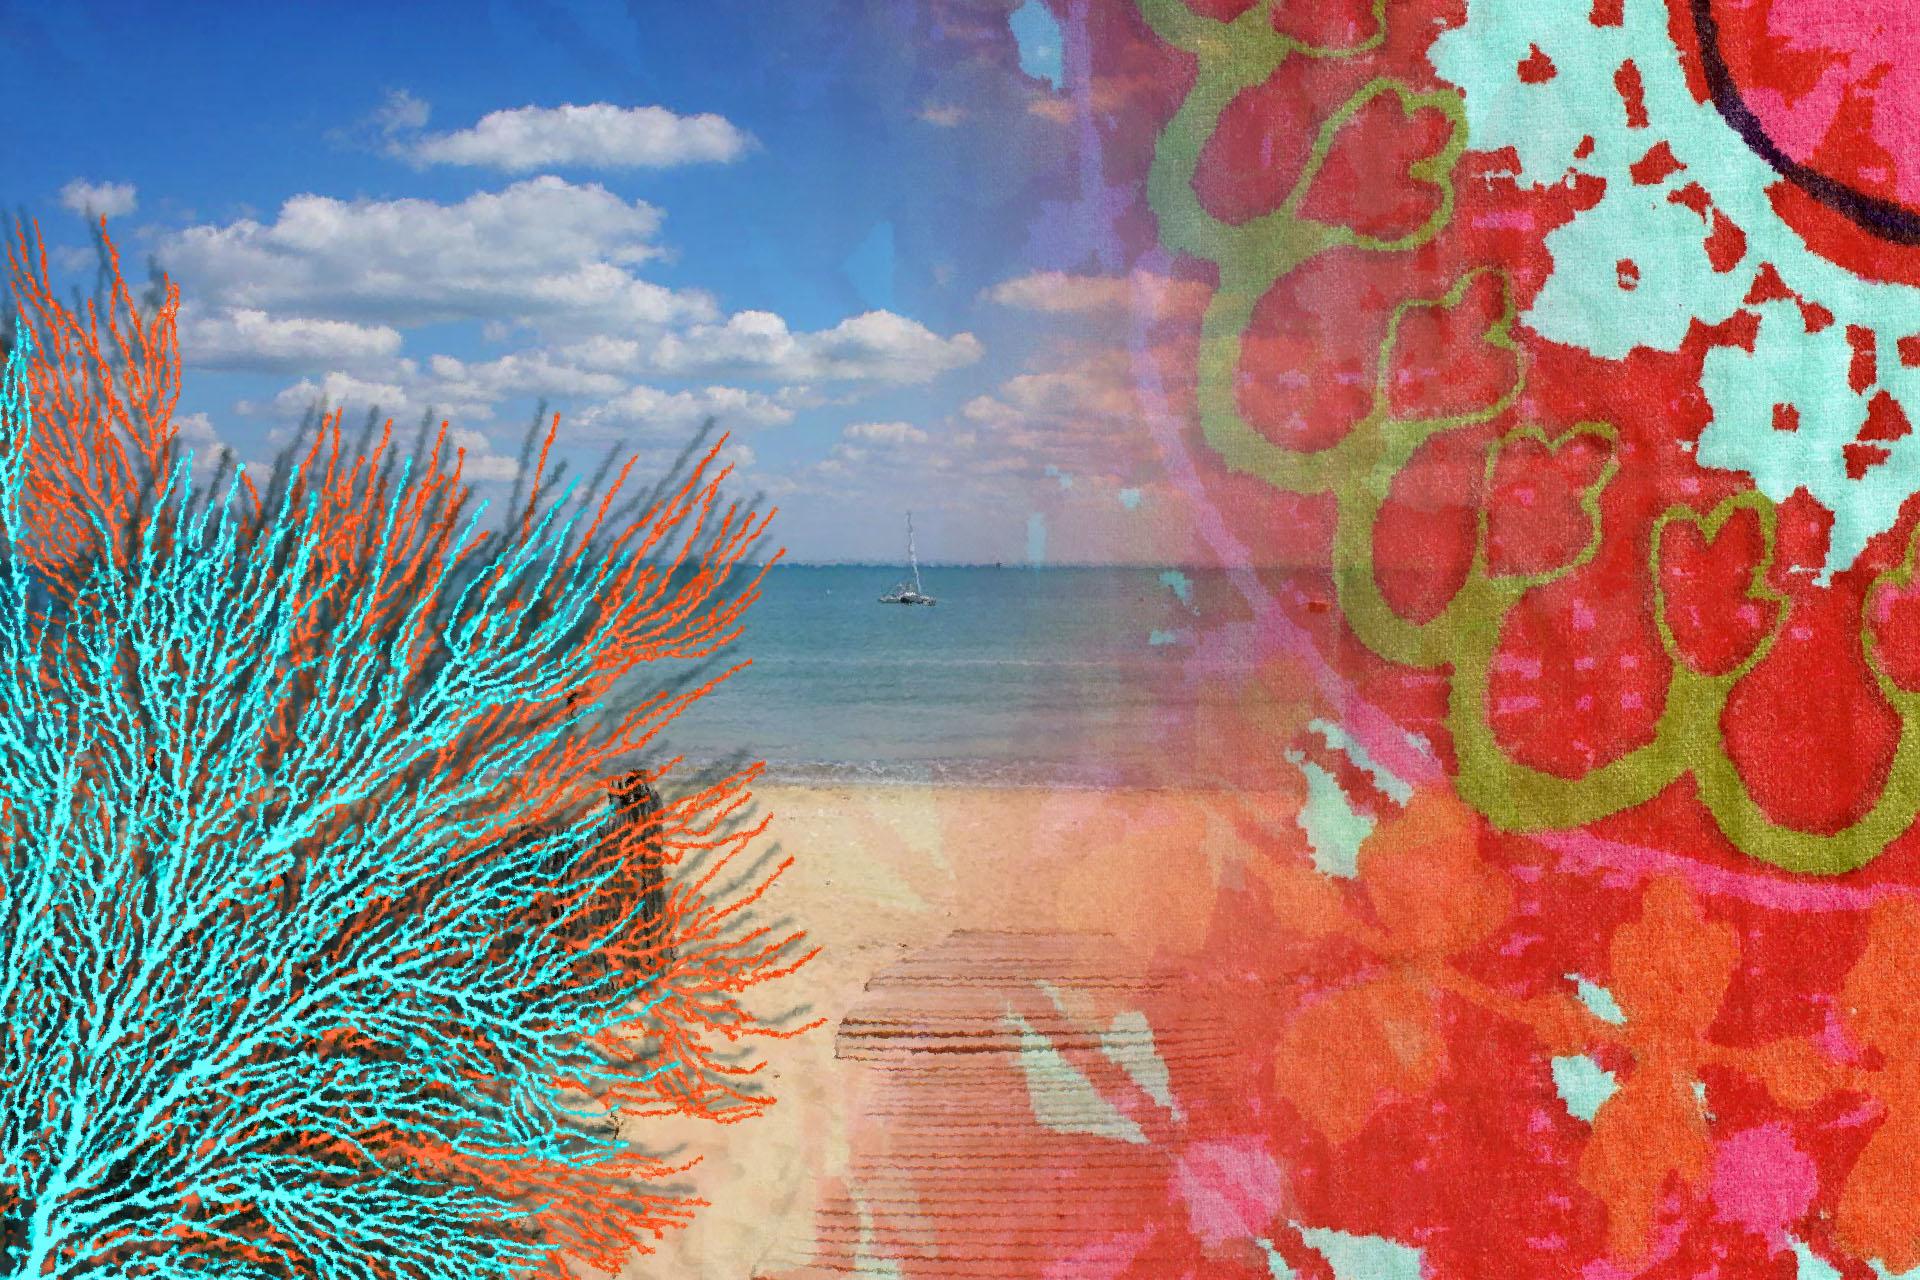 La plage 2 filtre